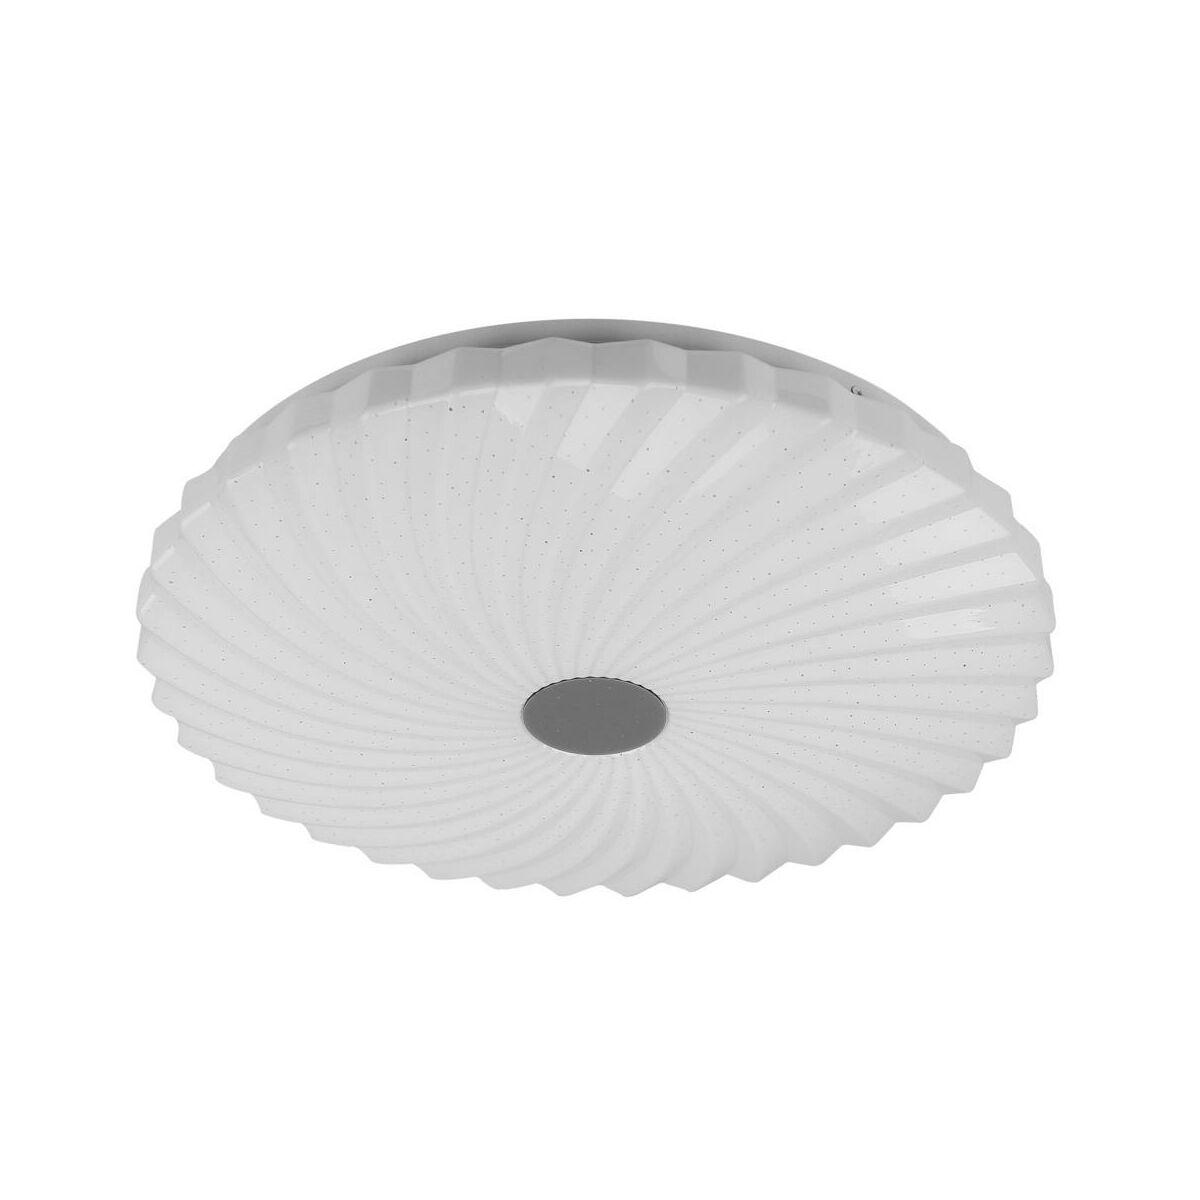 Plafon CALIPSO 38.5 cm 1680 lm LED CANDELLUX